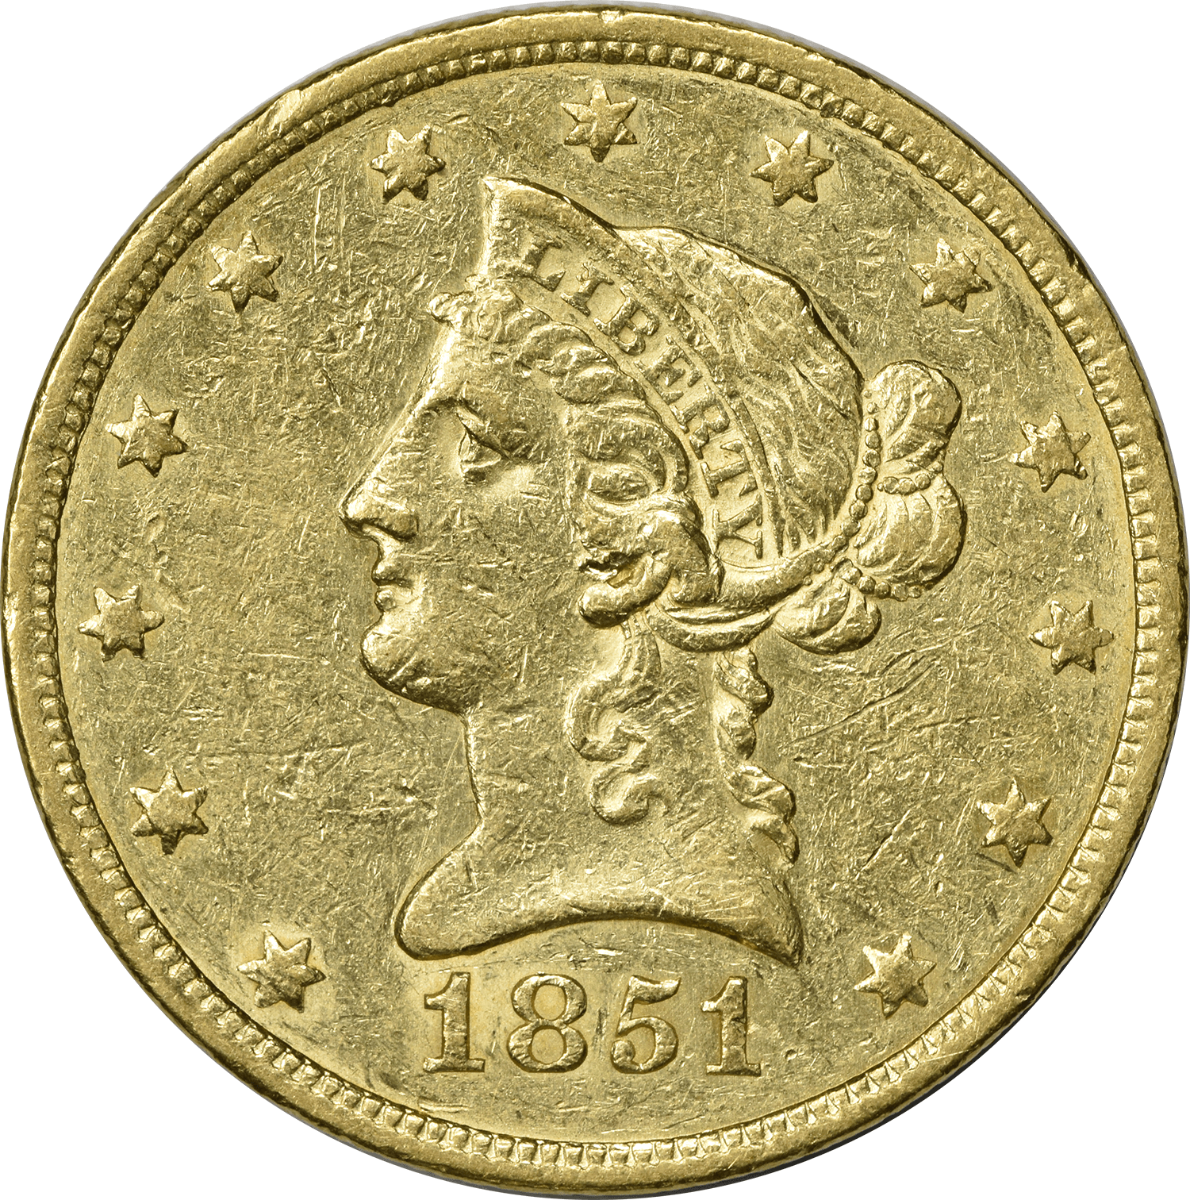 1851 $10 Gold Liberty Head EF Uncertified